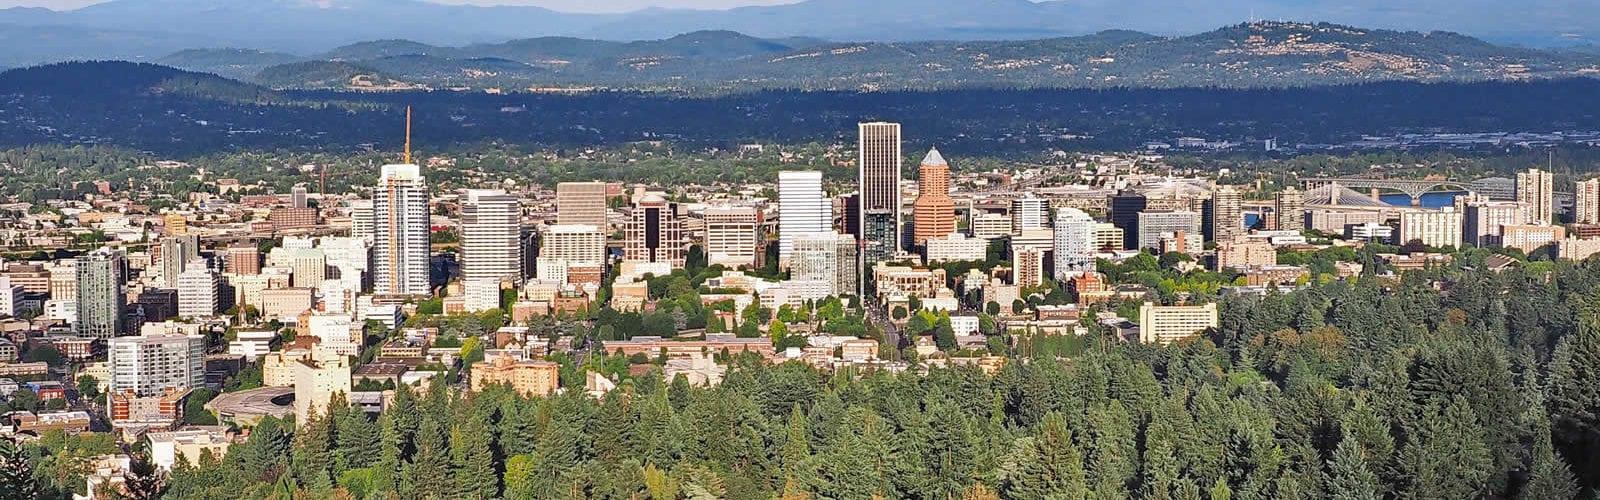 brancher dans l'Oregon en ligne datant dangereux